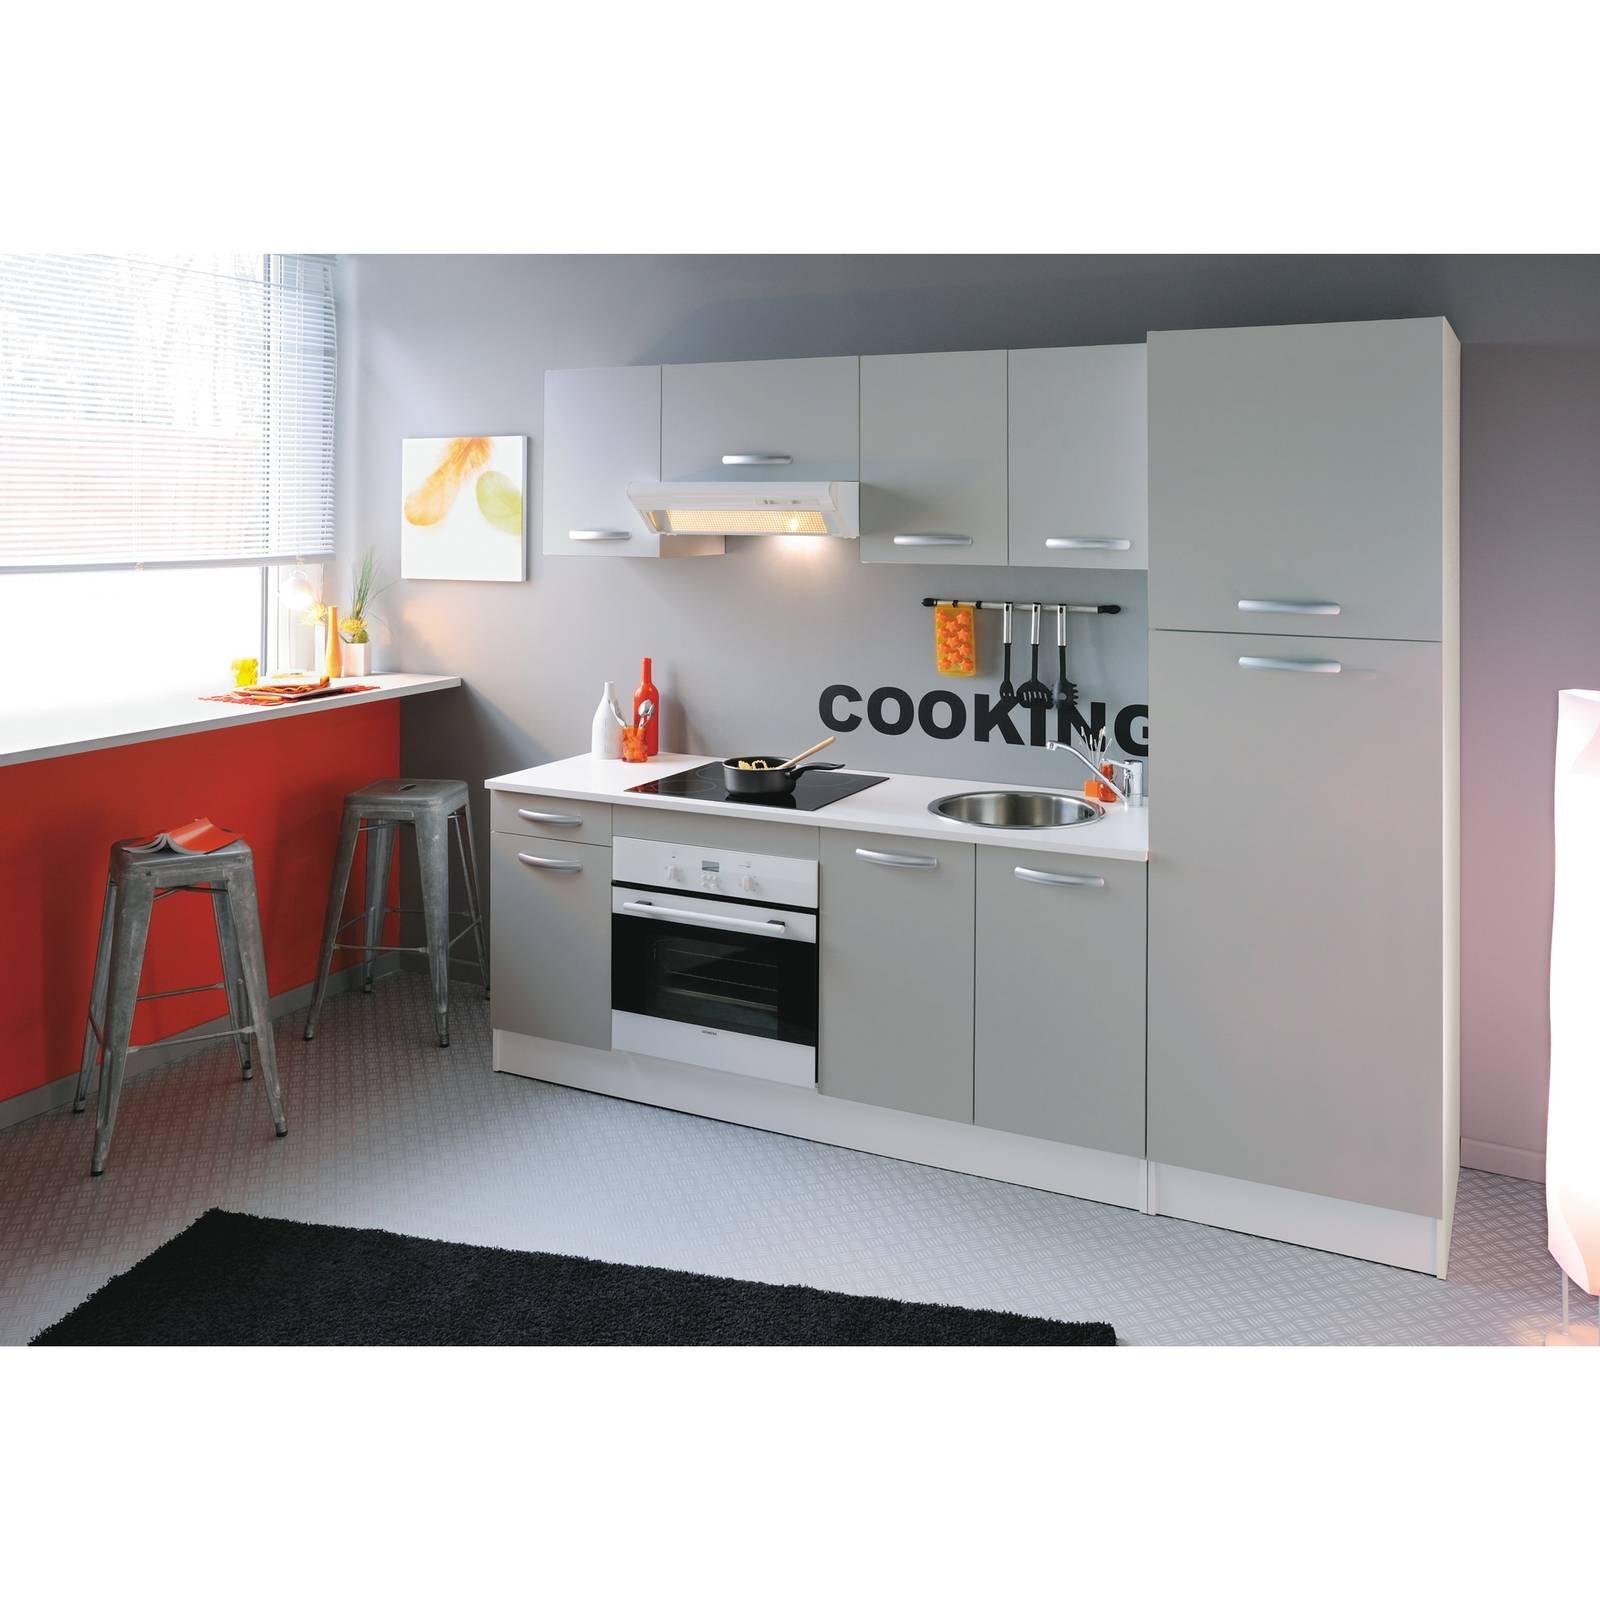 Elegant leroy merlin spring cucina con finestra with leroy merlin cucina - Cucina economica a legna leroy merlin ...